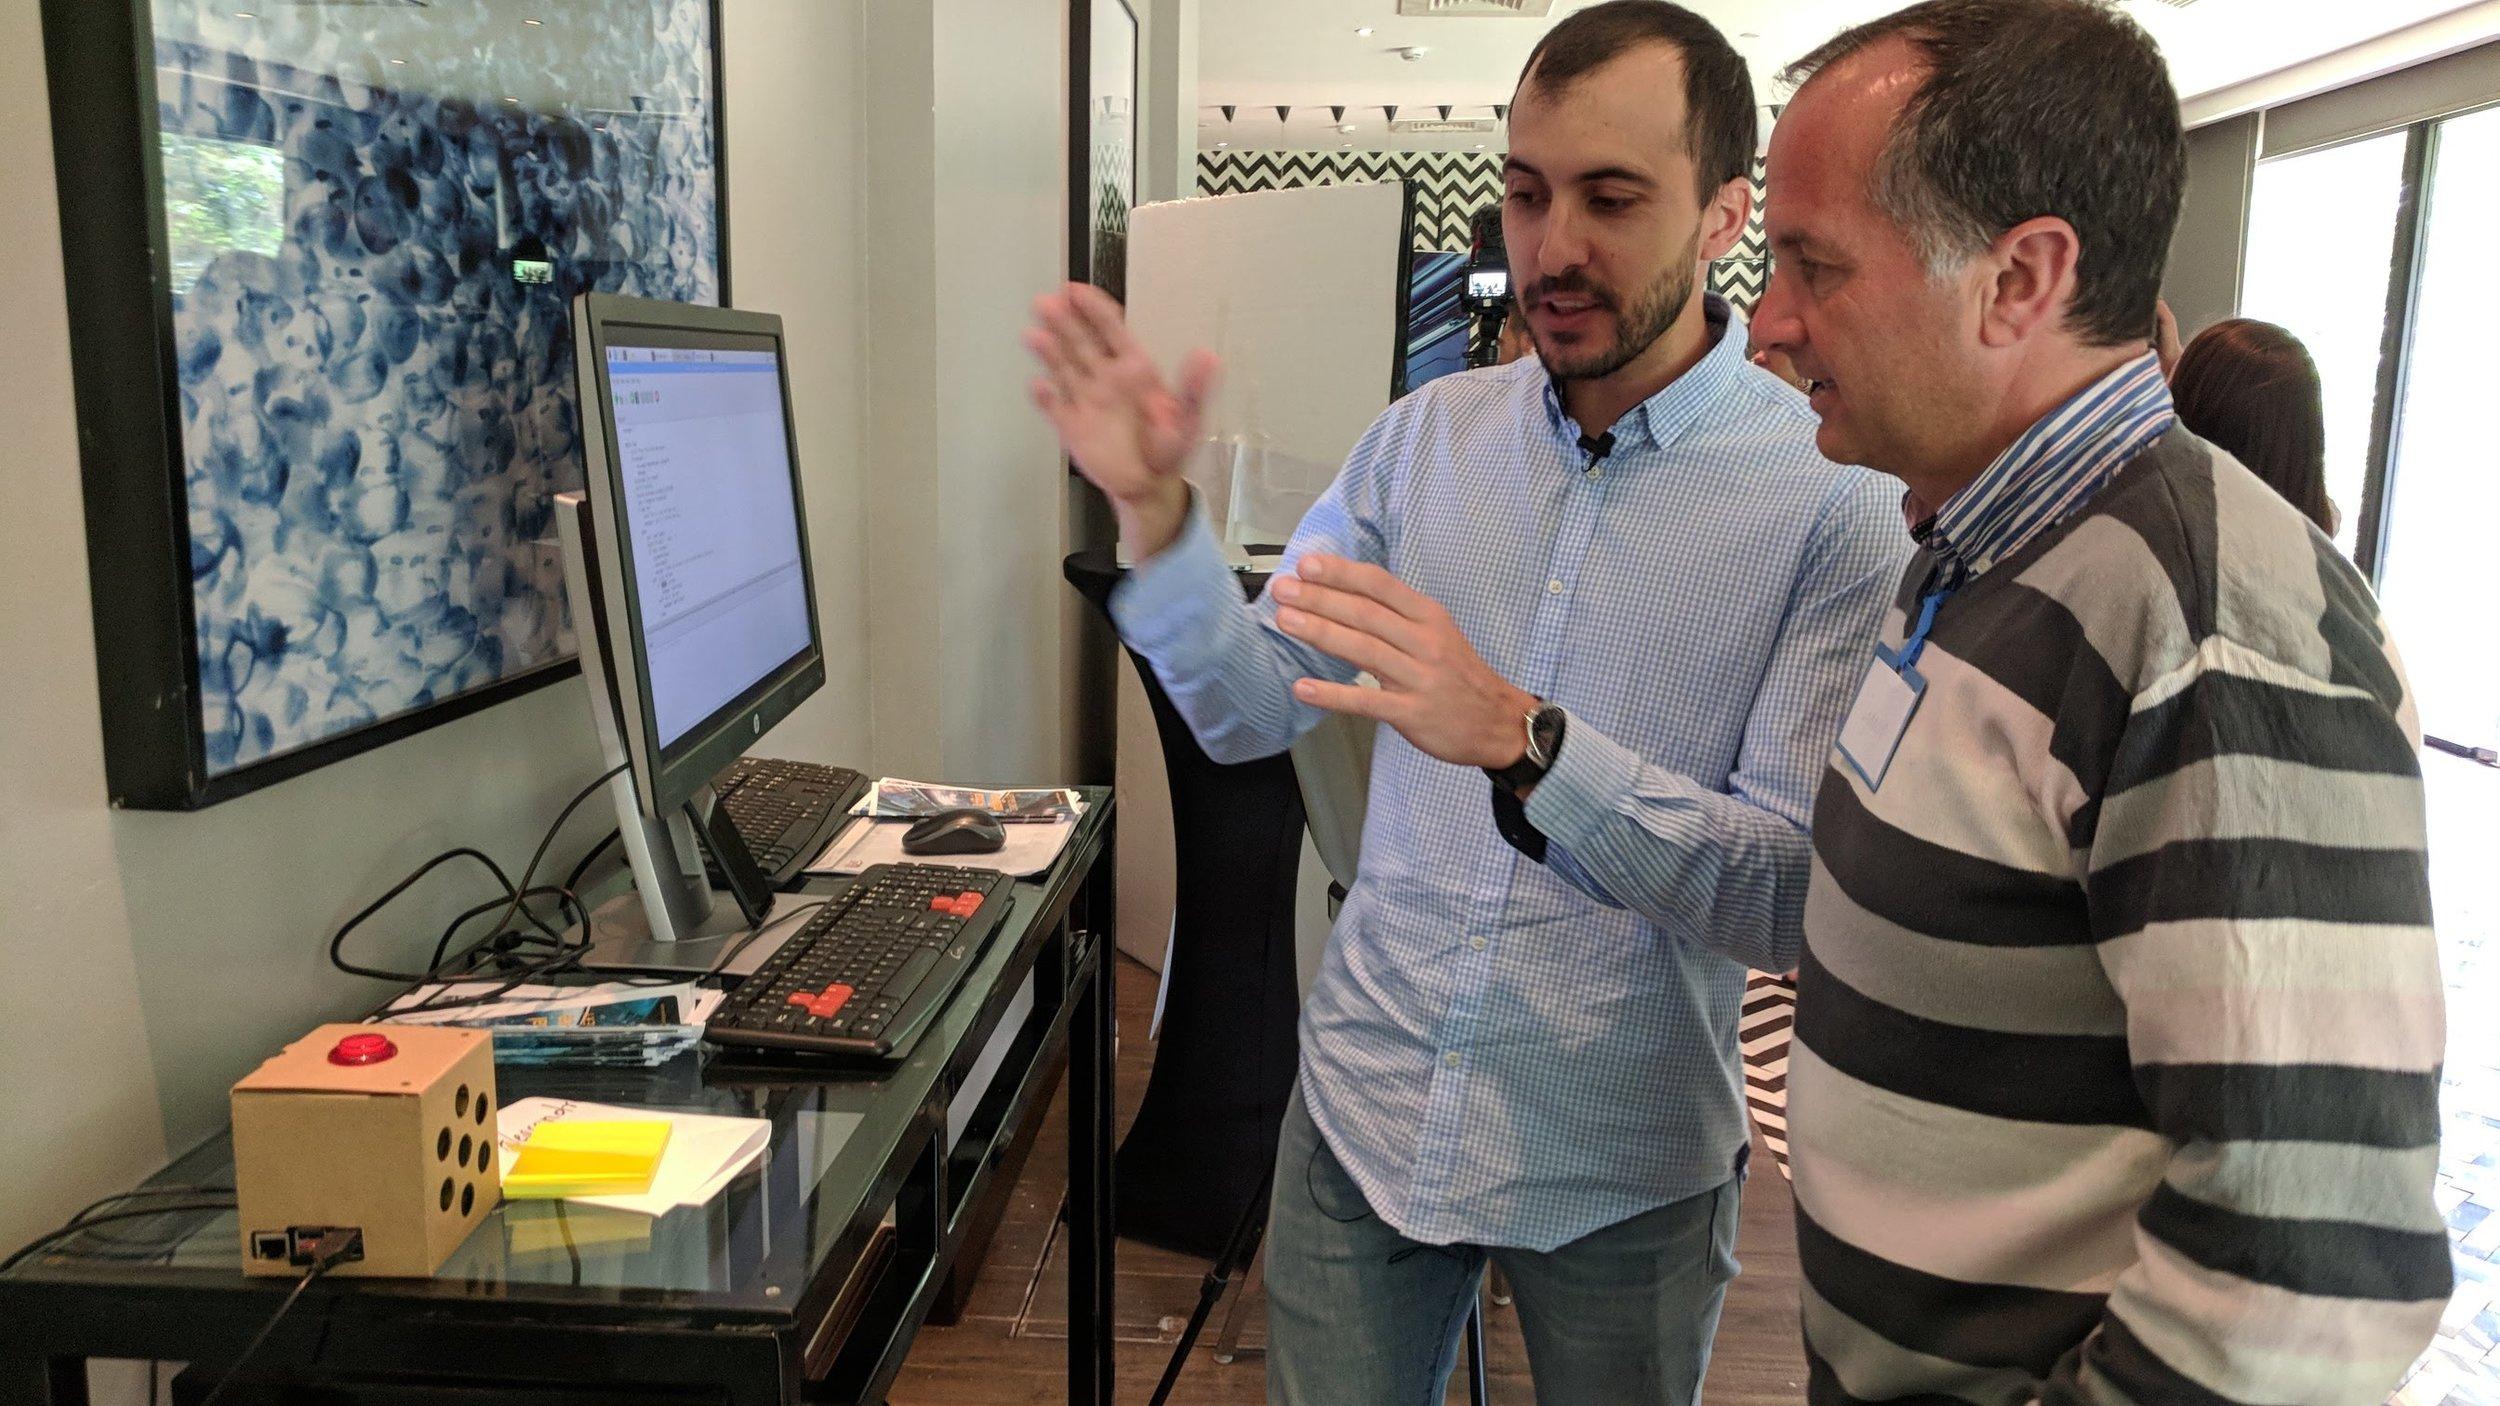 Explaining the customized merchant assistant